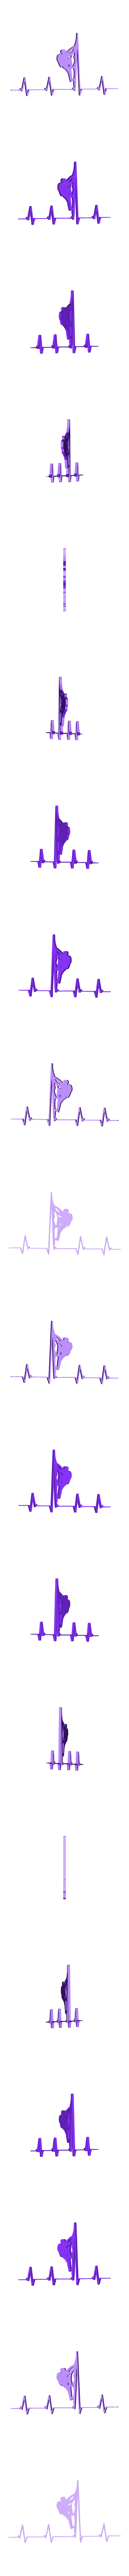 climbing.stl Download free STL file Heart Beat Gaming I Music I Climbing  2D • 3D printable template, UnpredictableLab